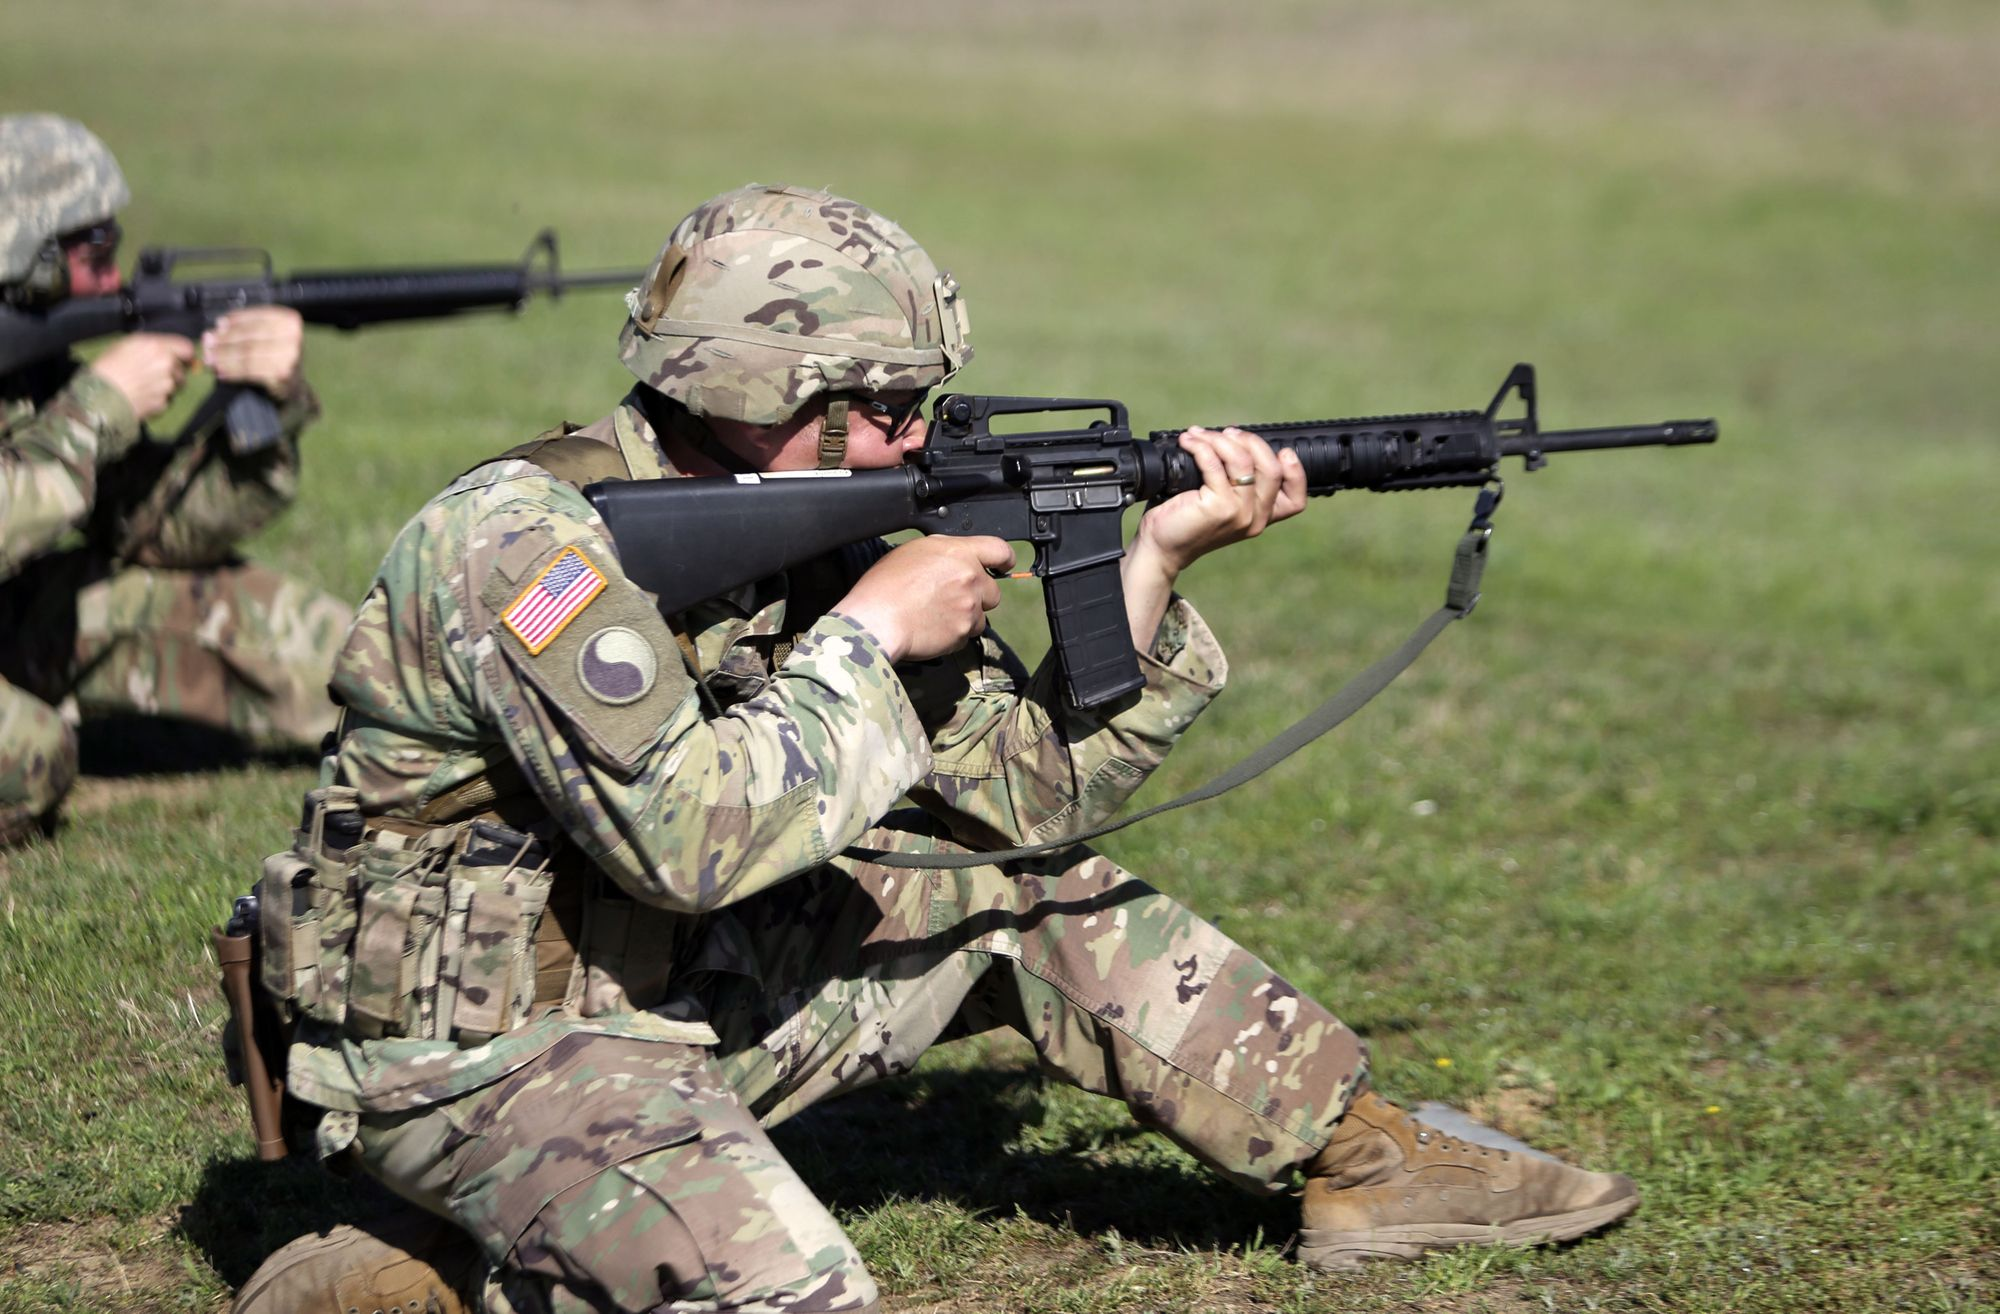 US Military Police Company Hones Marksmanship Skills in Firearms Training Simulator